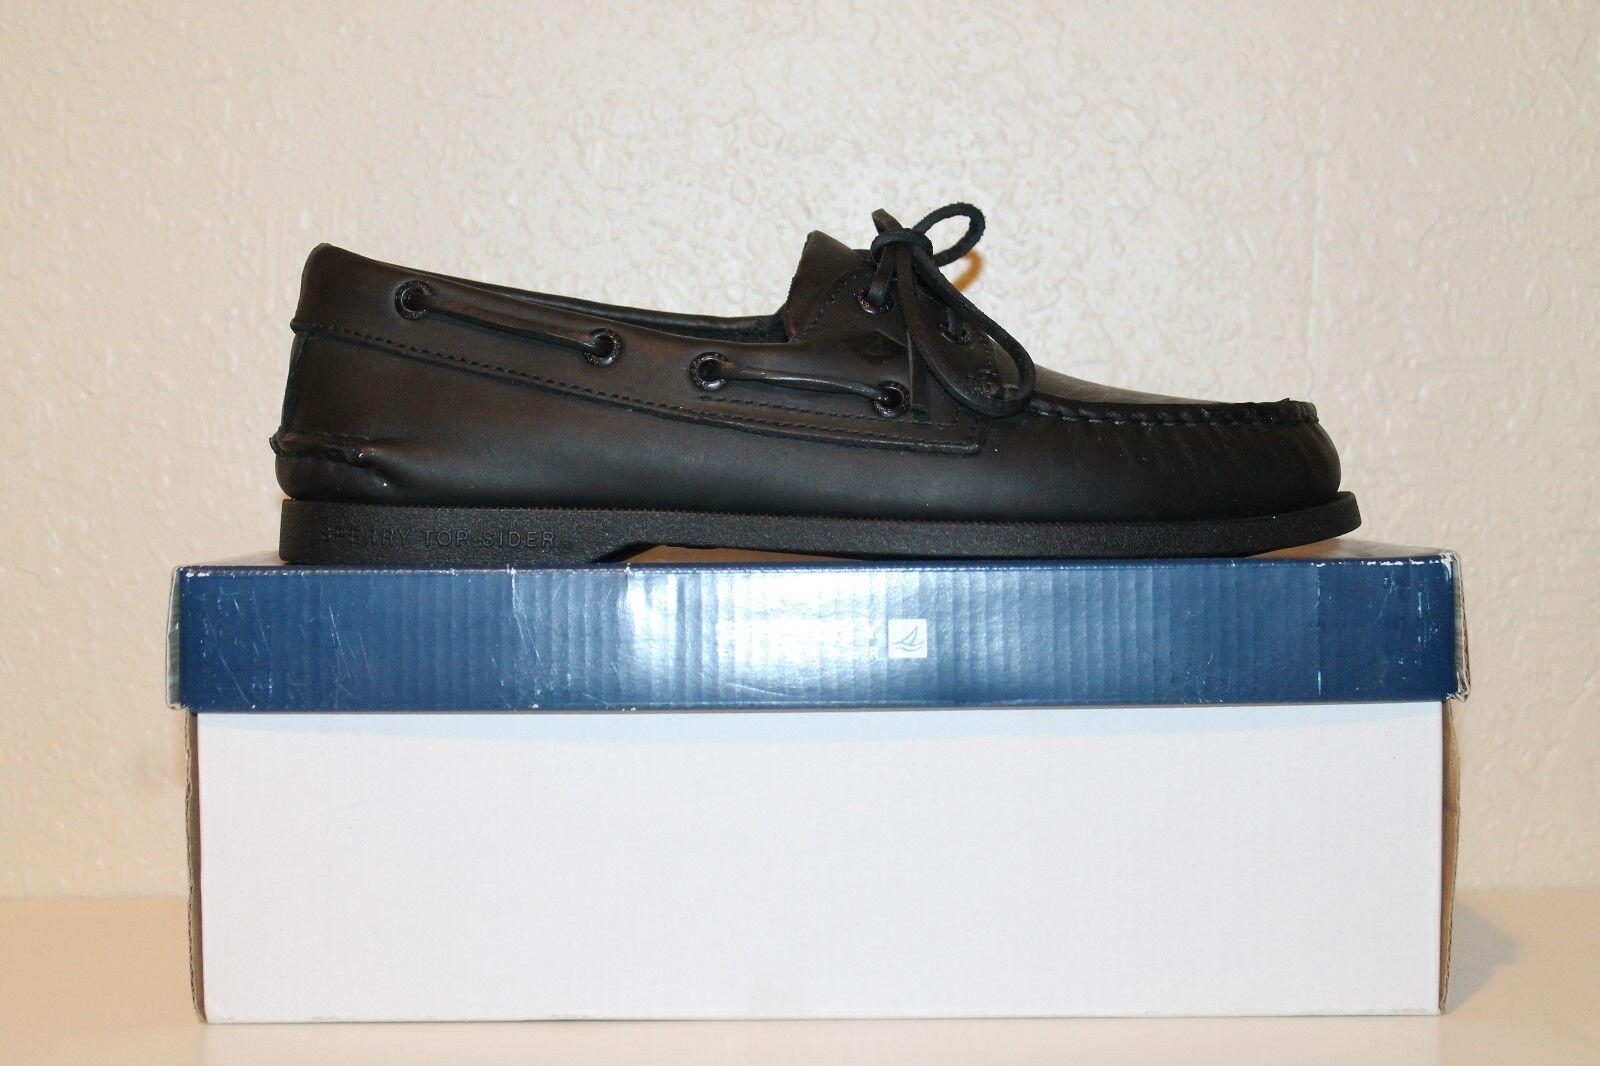 d6e0c1f4091078 Mens Sperry Authentic Original 2 Eye Classic Boat Shoes Black 9 2e ...